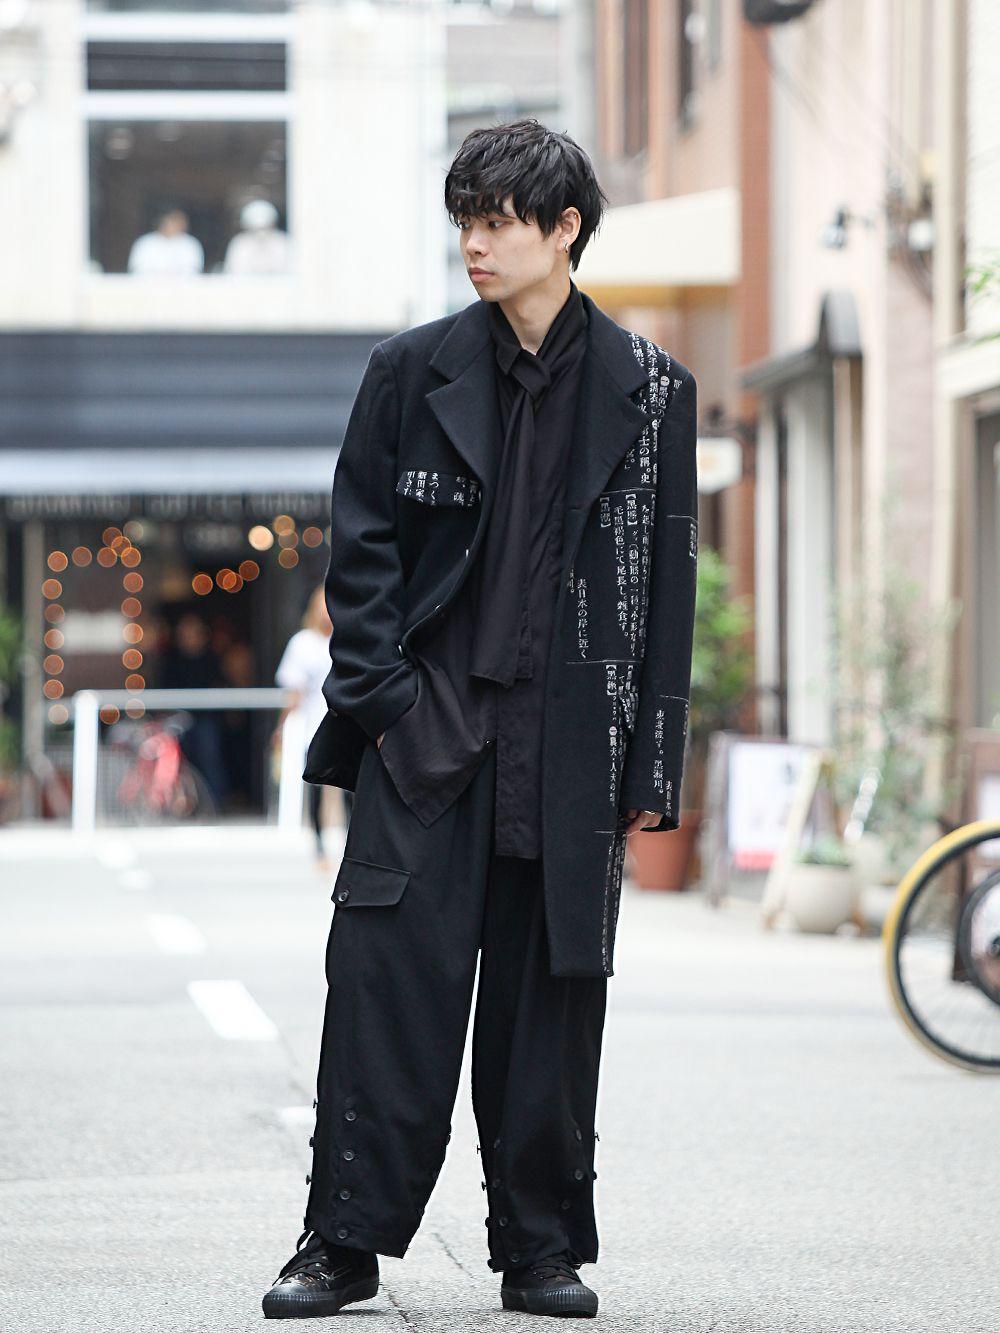 Yohji Yamamoto Asymmetry Dictionary Jacket Style - 1-001